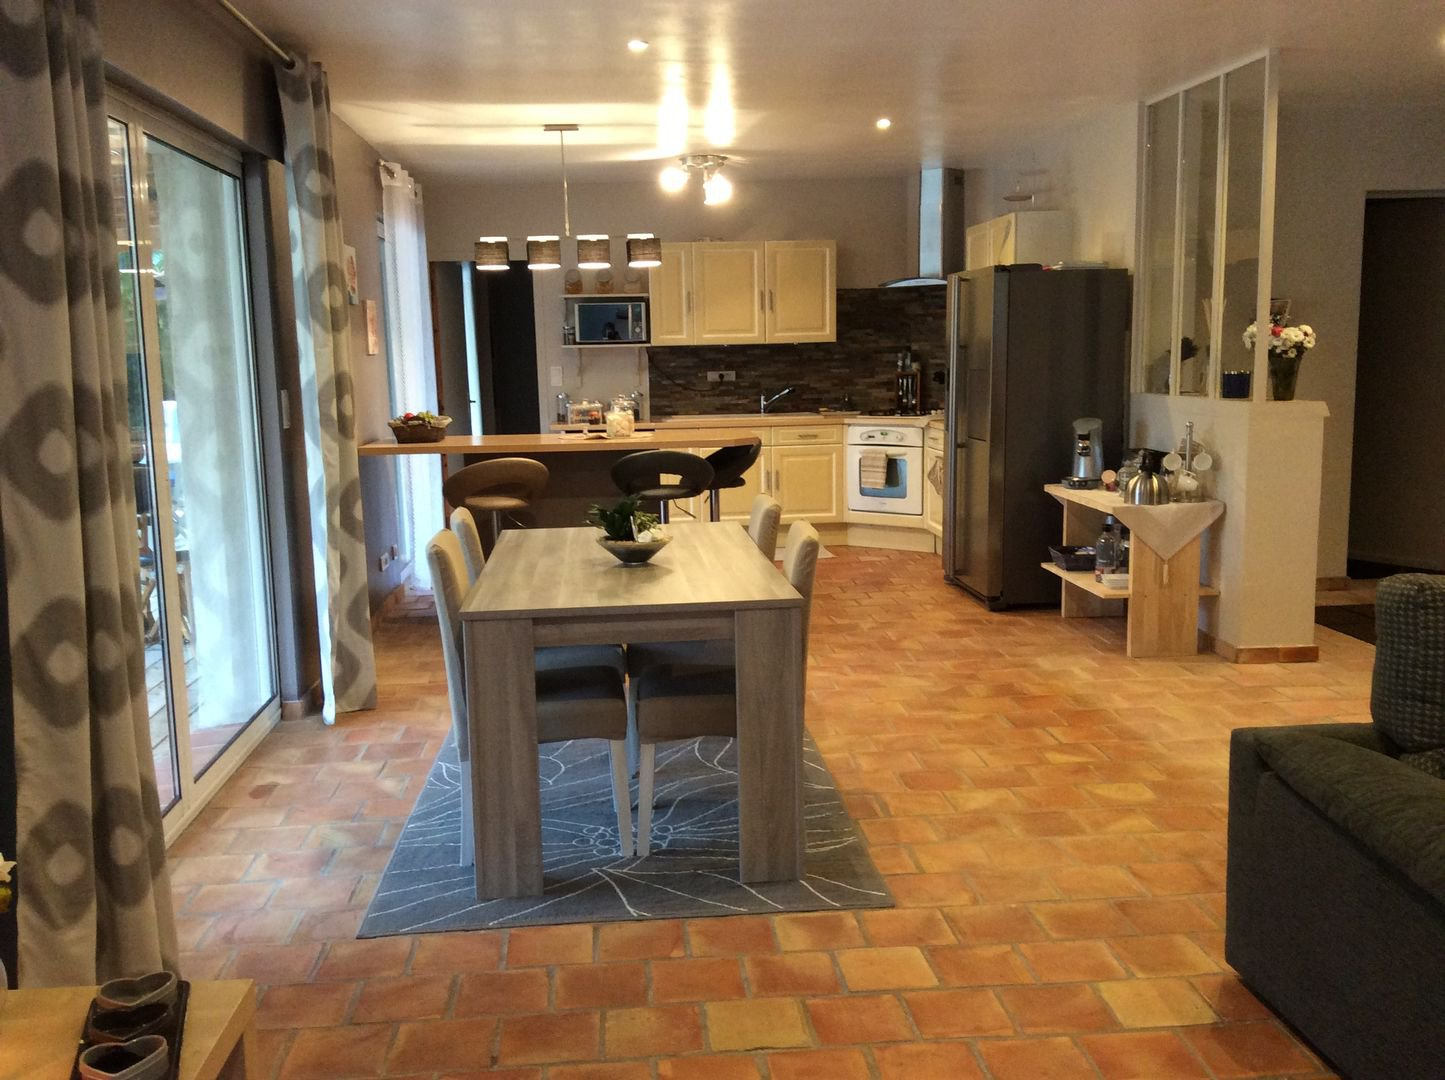 Ventilateur de plafond, acier inoxydable, lumière naturelle, îlot de cuisine